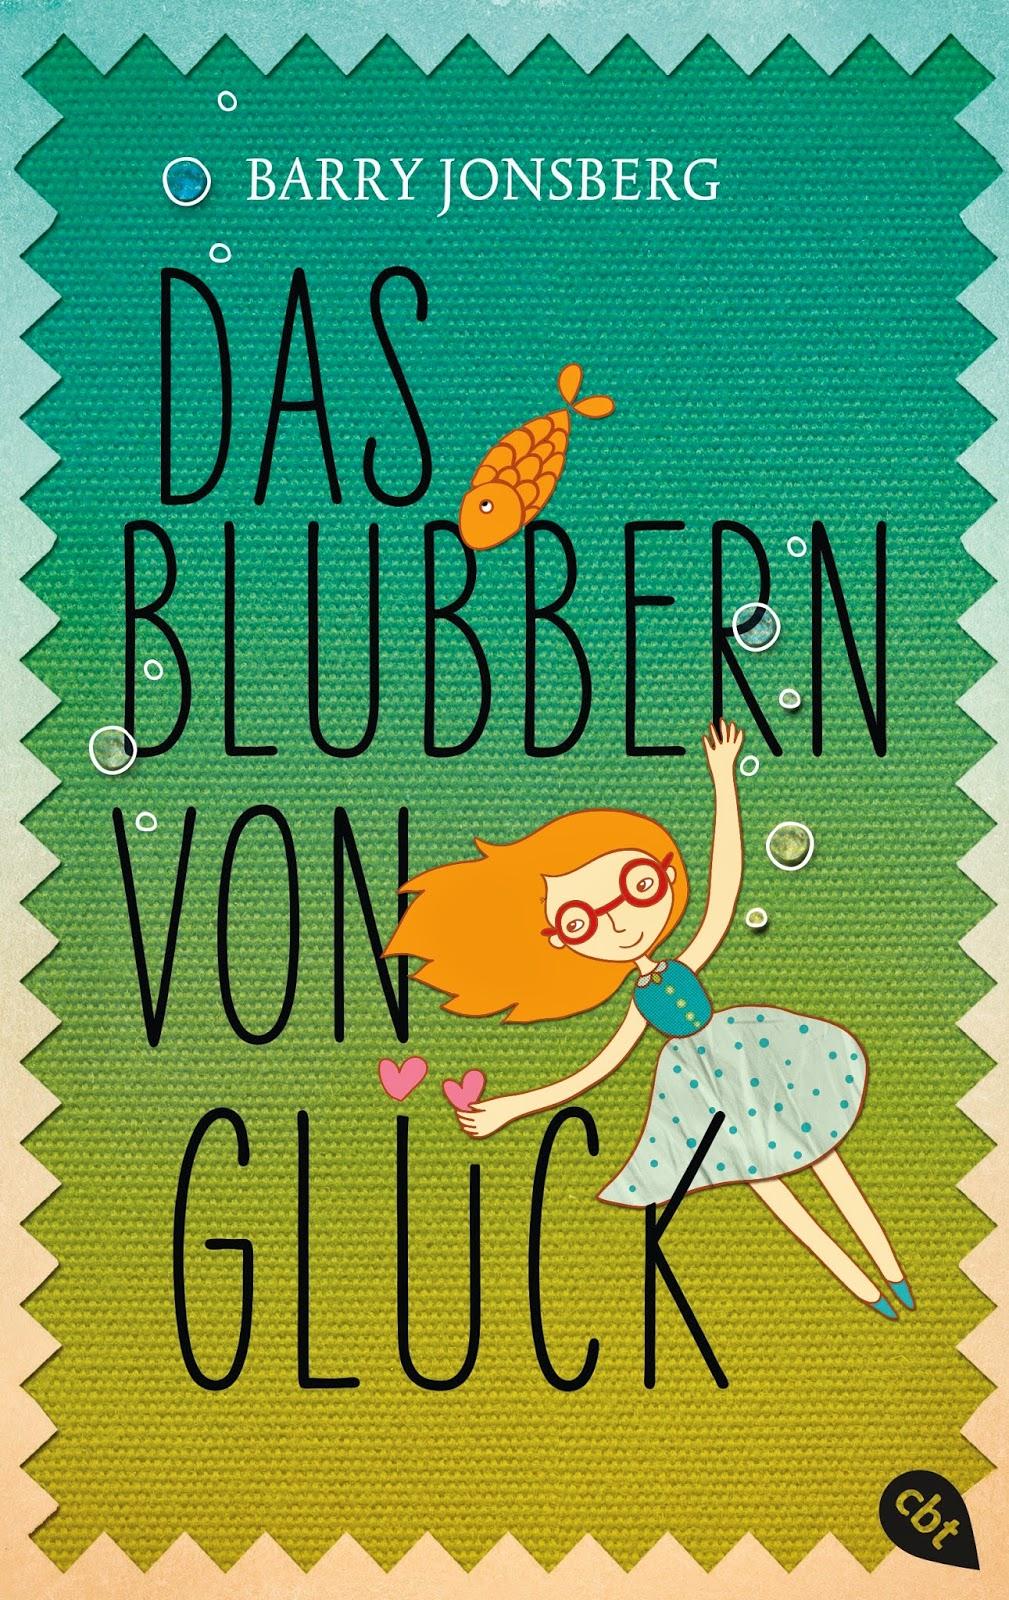 http://www.amazon.de/Das-Blubbern-Gl%C3%BCck-Barry-Jonsberg/dp/3570162869/ref=sr_1_1_twi_2?ie=UTF8&qid=1419089703&sr=8-1&keywords=das+blubbern+von+gl%C3%BCck